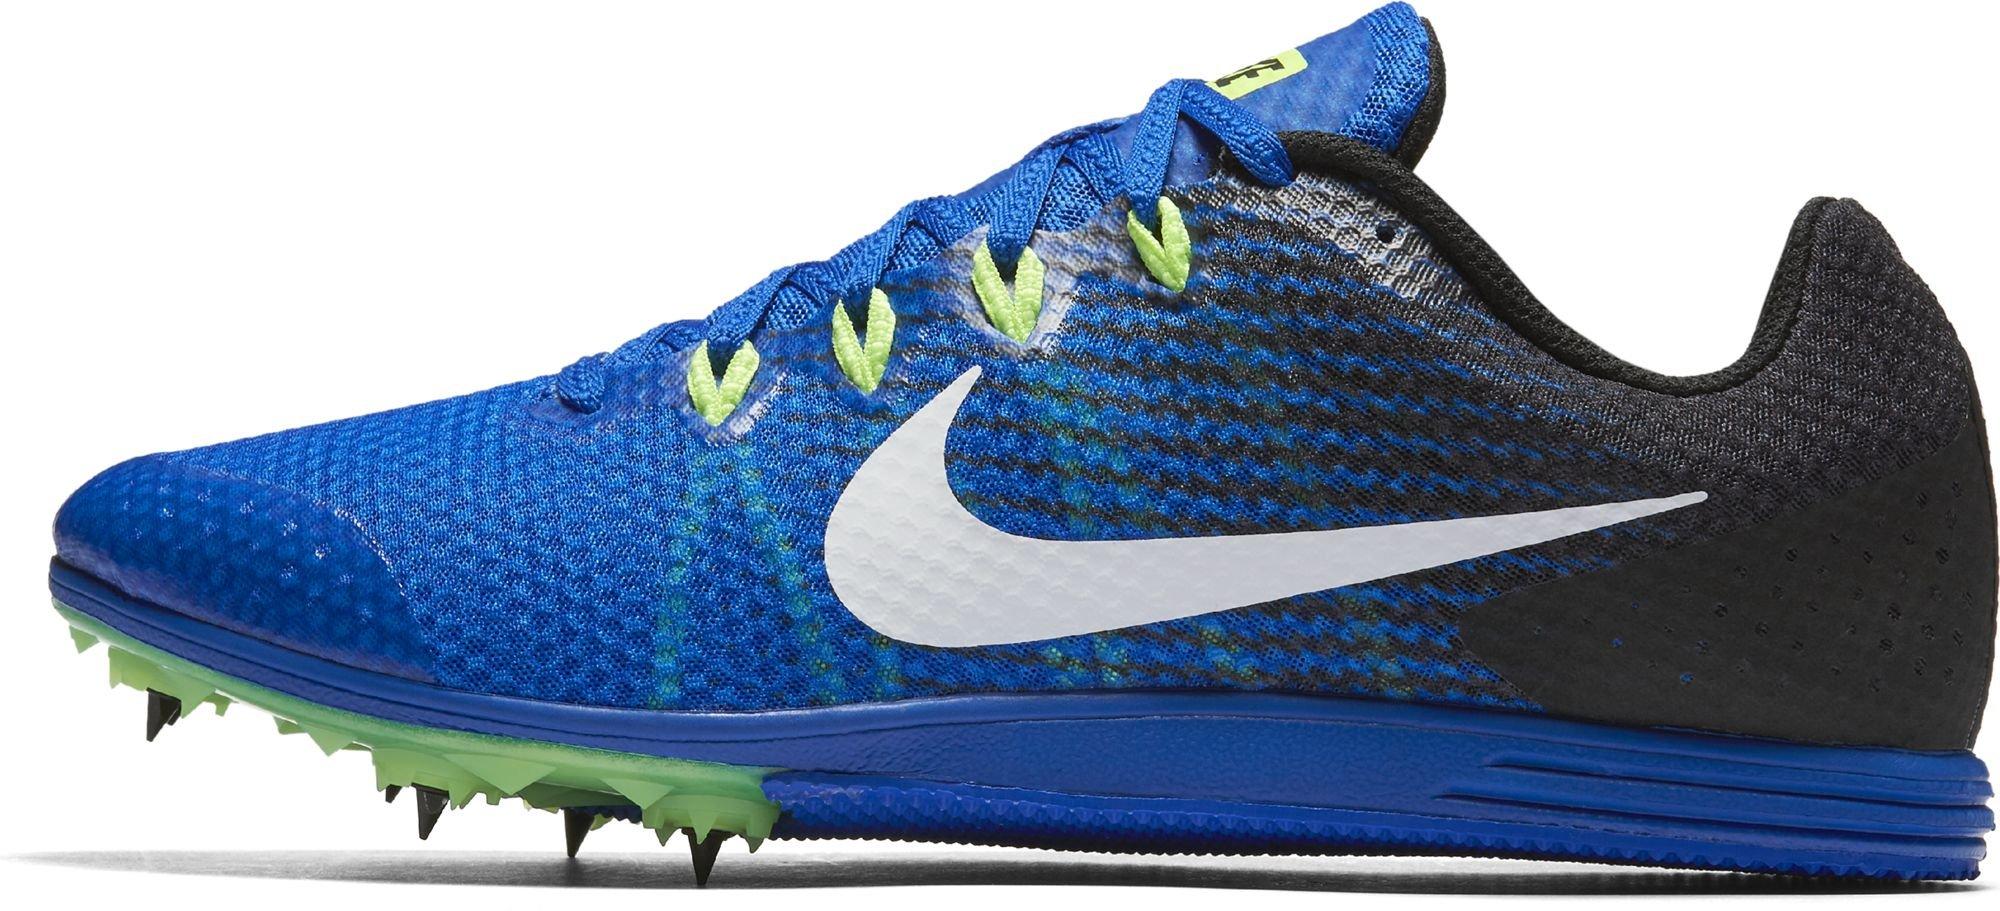 Nike Men s Zoom Rival D 9 Track Spike Hyper Cobalt White Black Ghost a535053d3